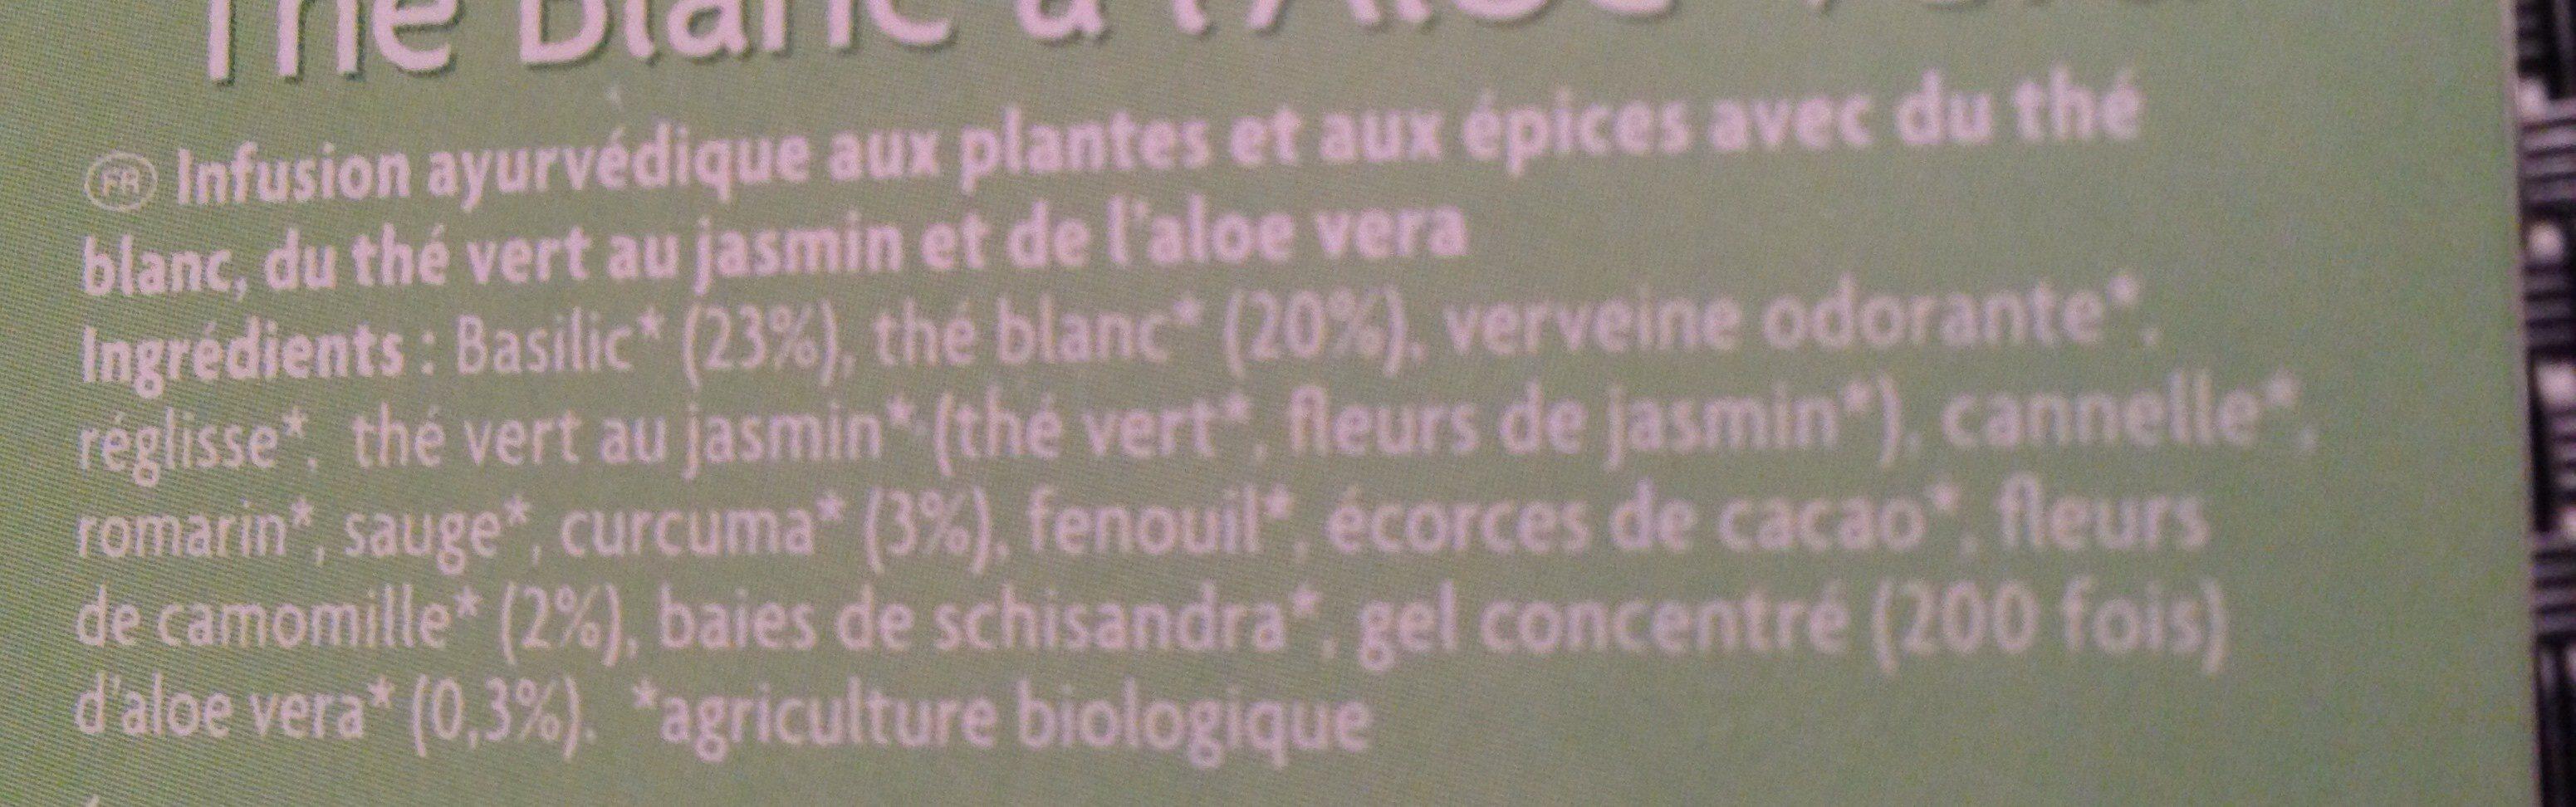 Thé Blanc à l'Aloe vera - Ingrédients - fr